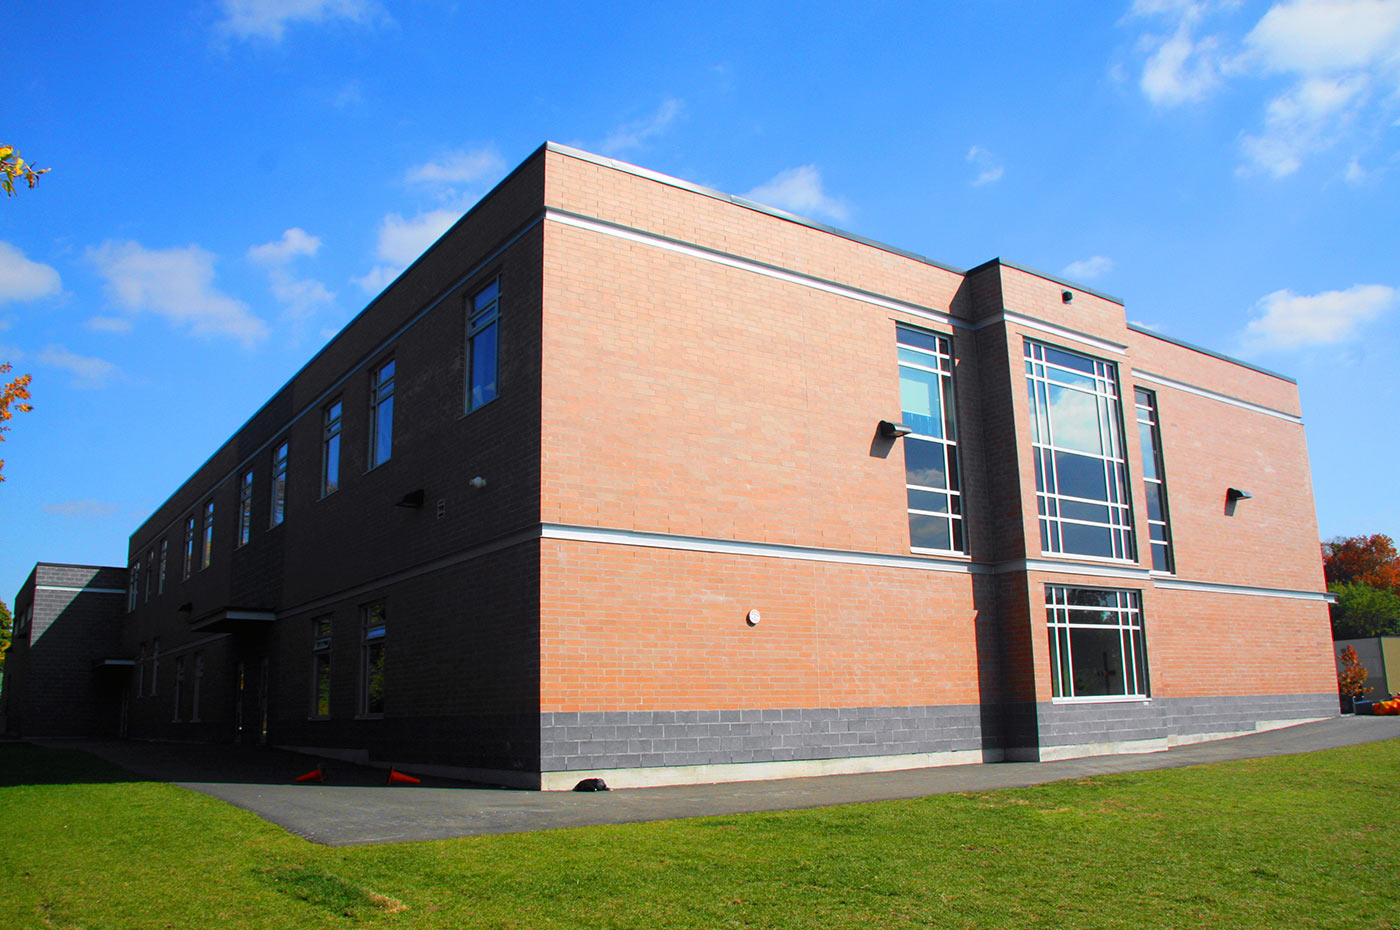 St. Anne Elementary School